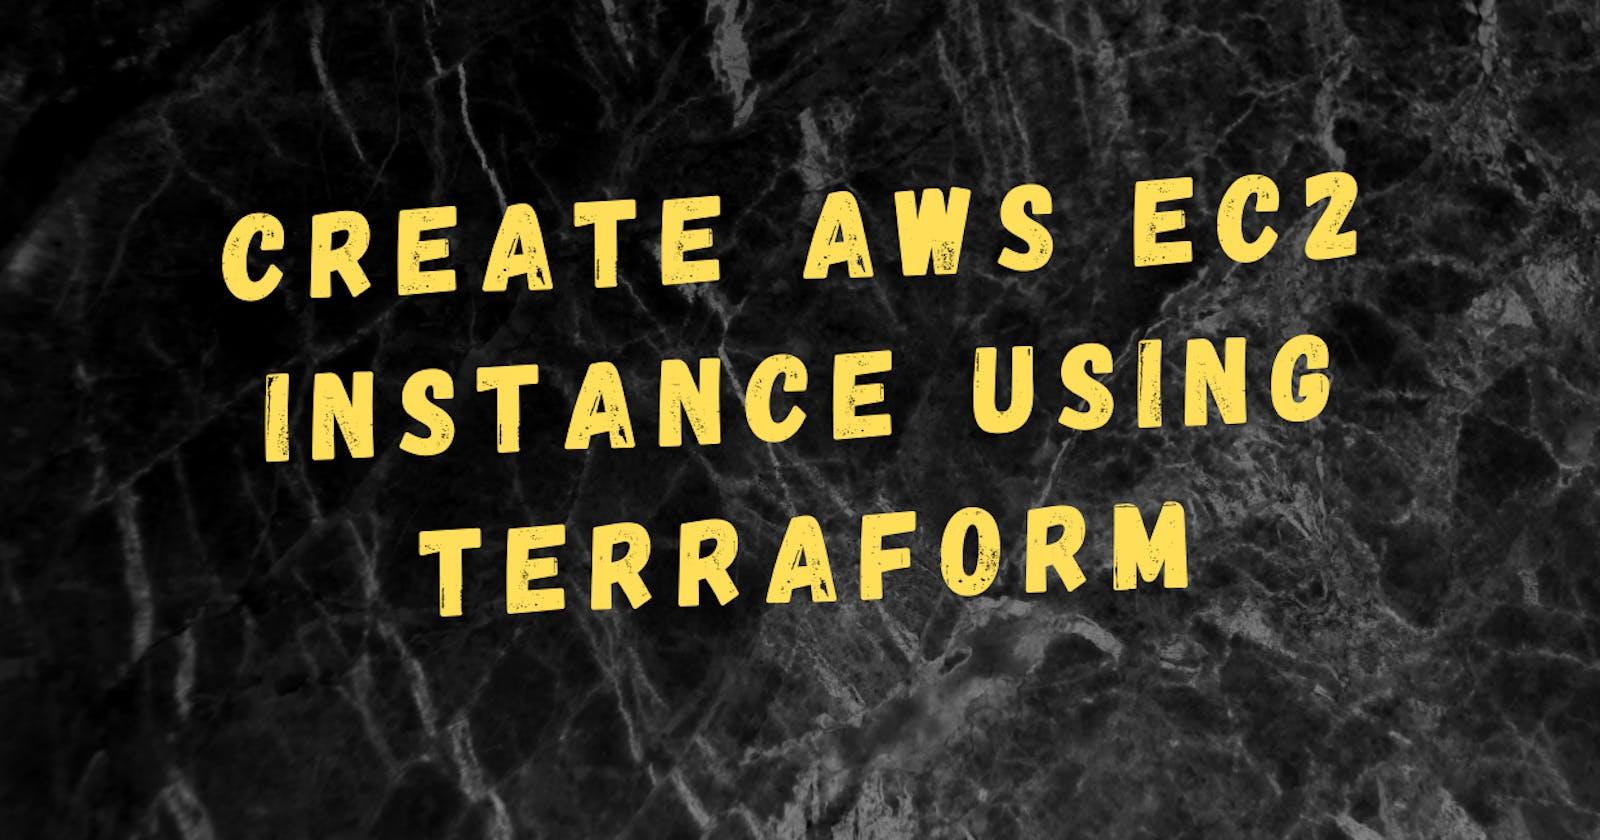 Create EC2 instance using Terraform